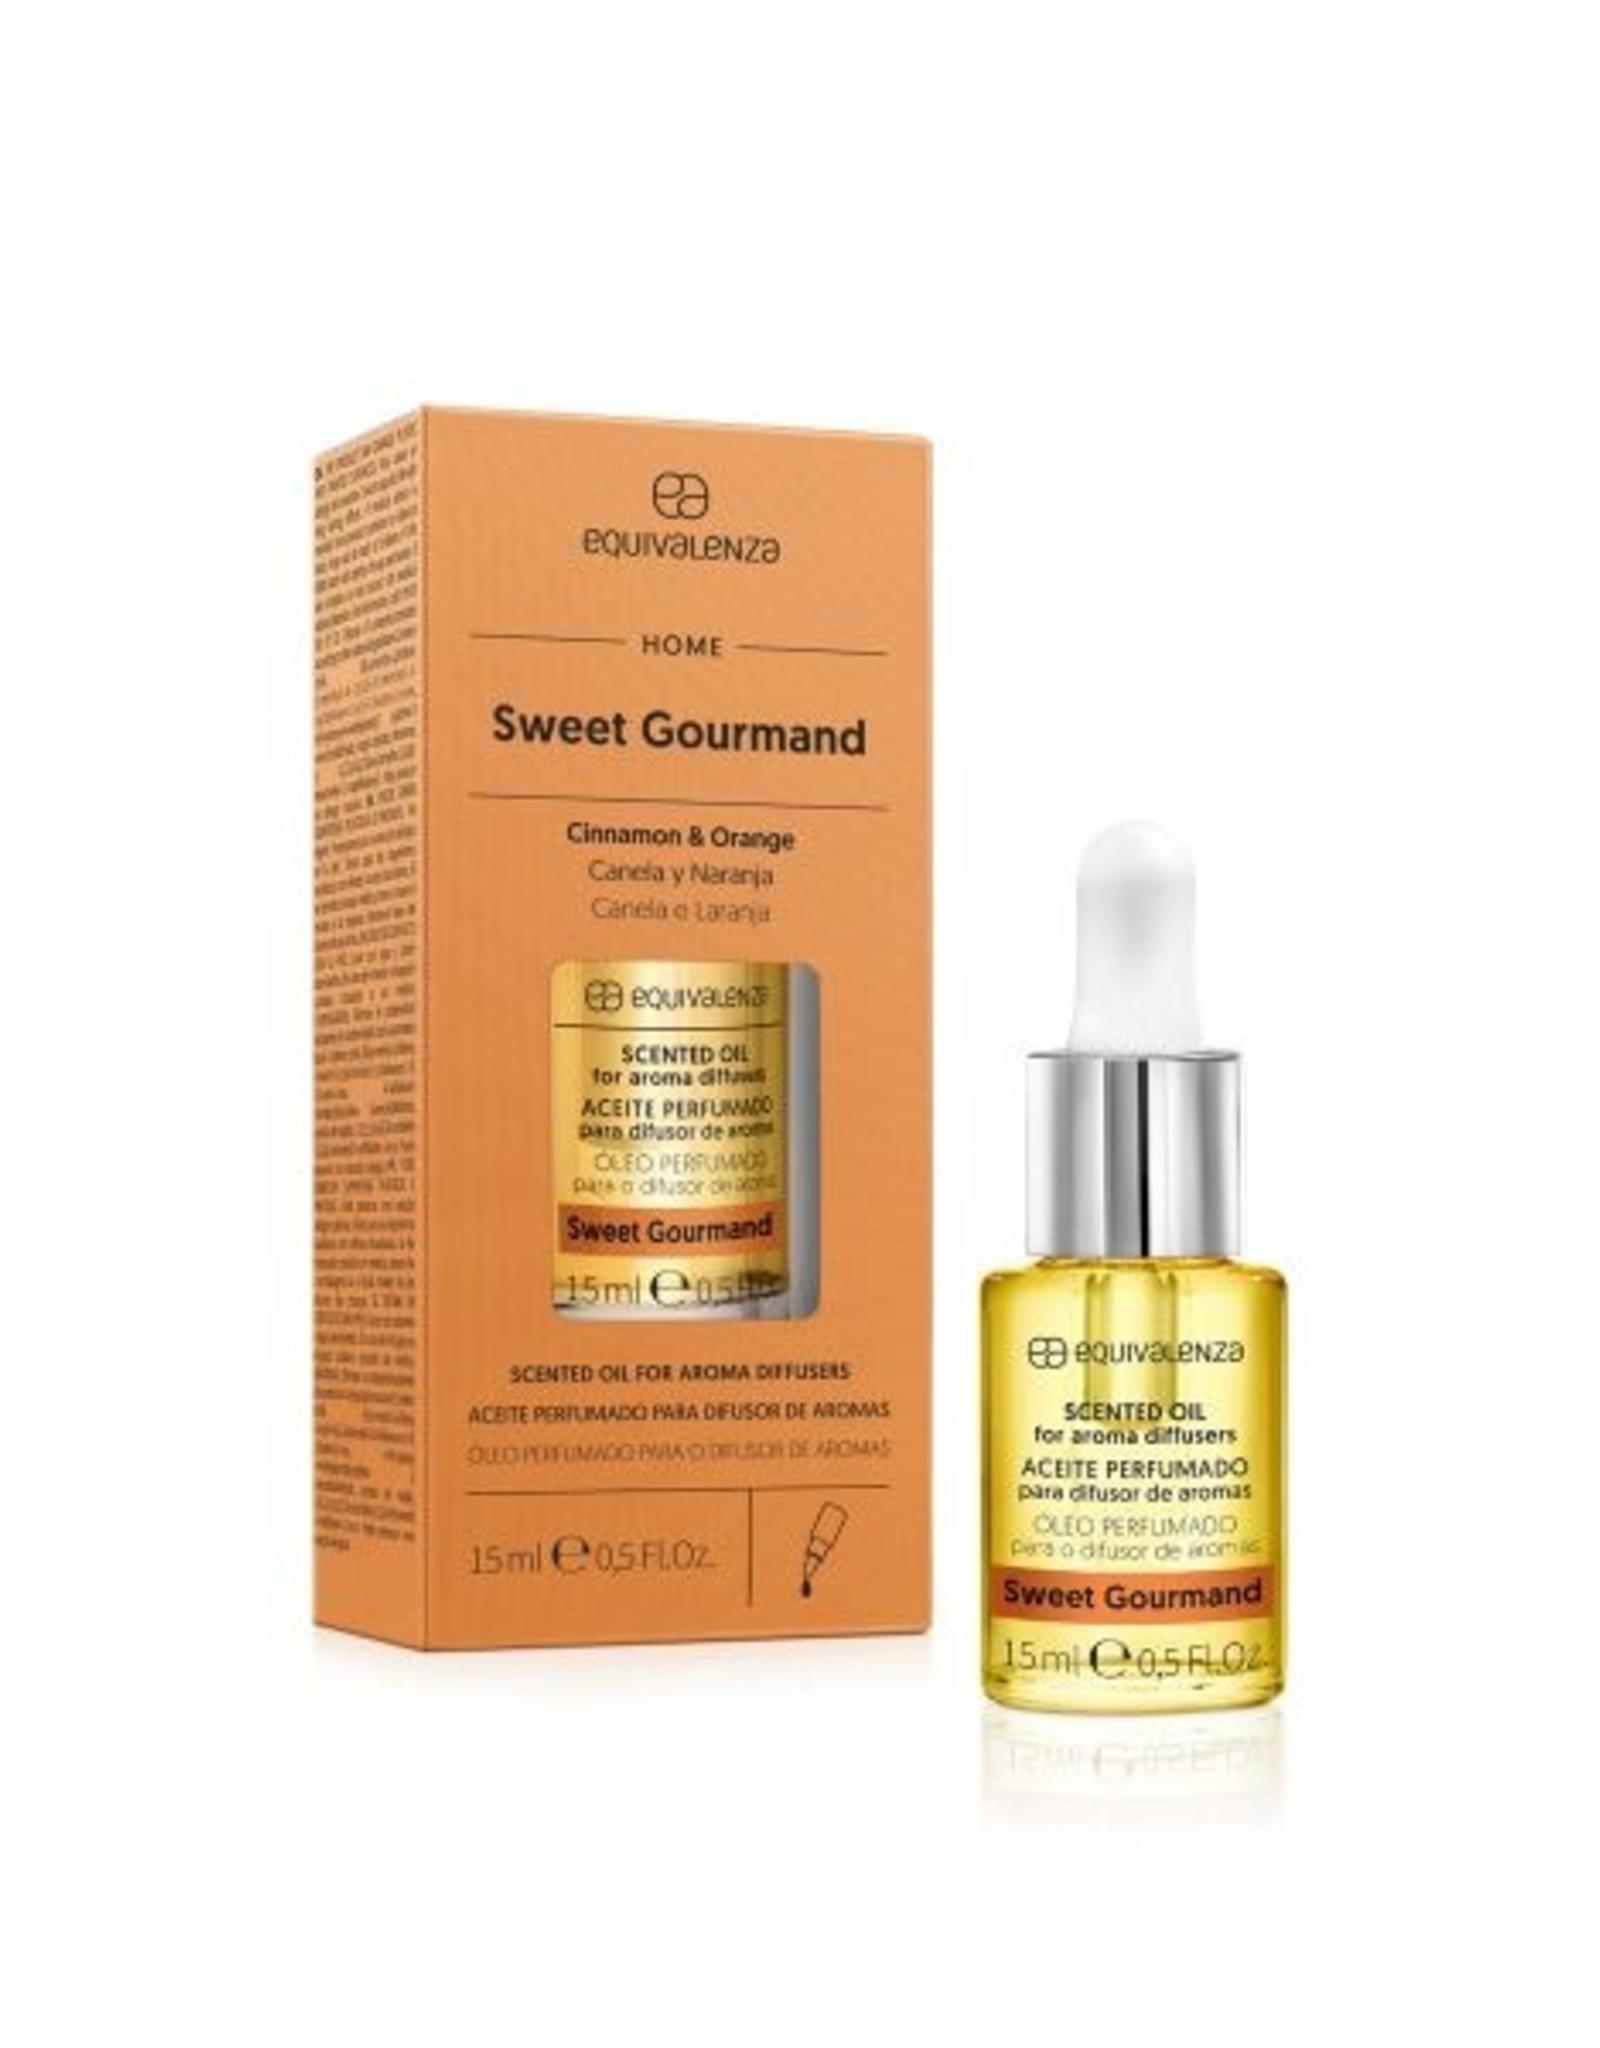 Equivalenza Essential Oil – Sweet Gourmand (orange and cinnamon)